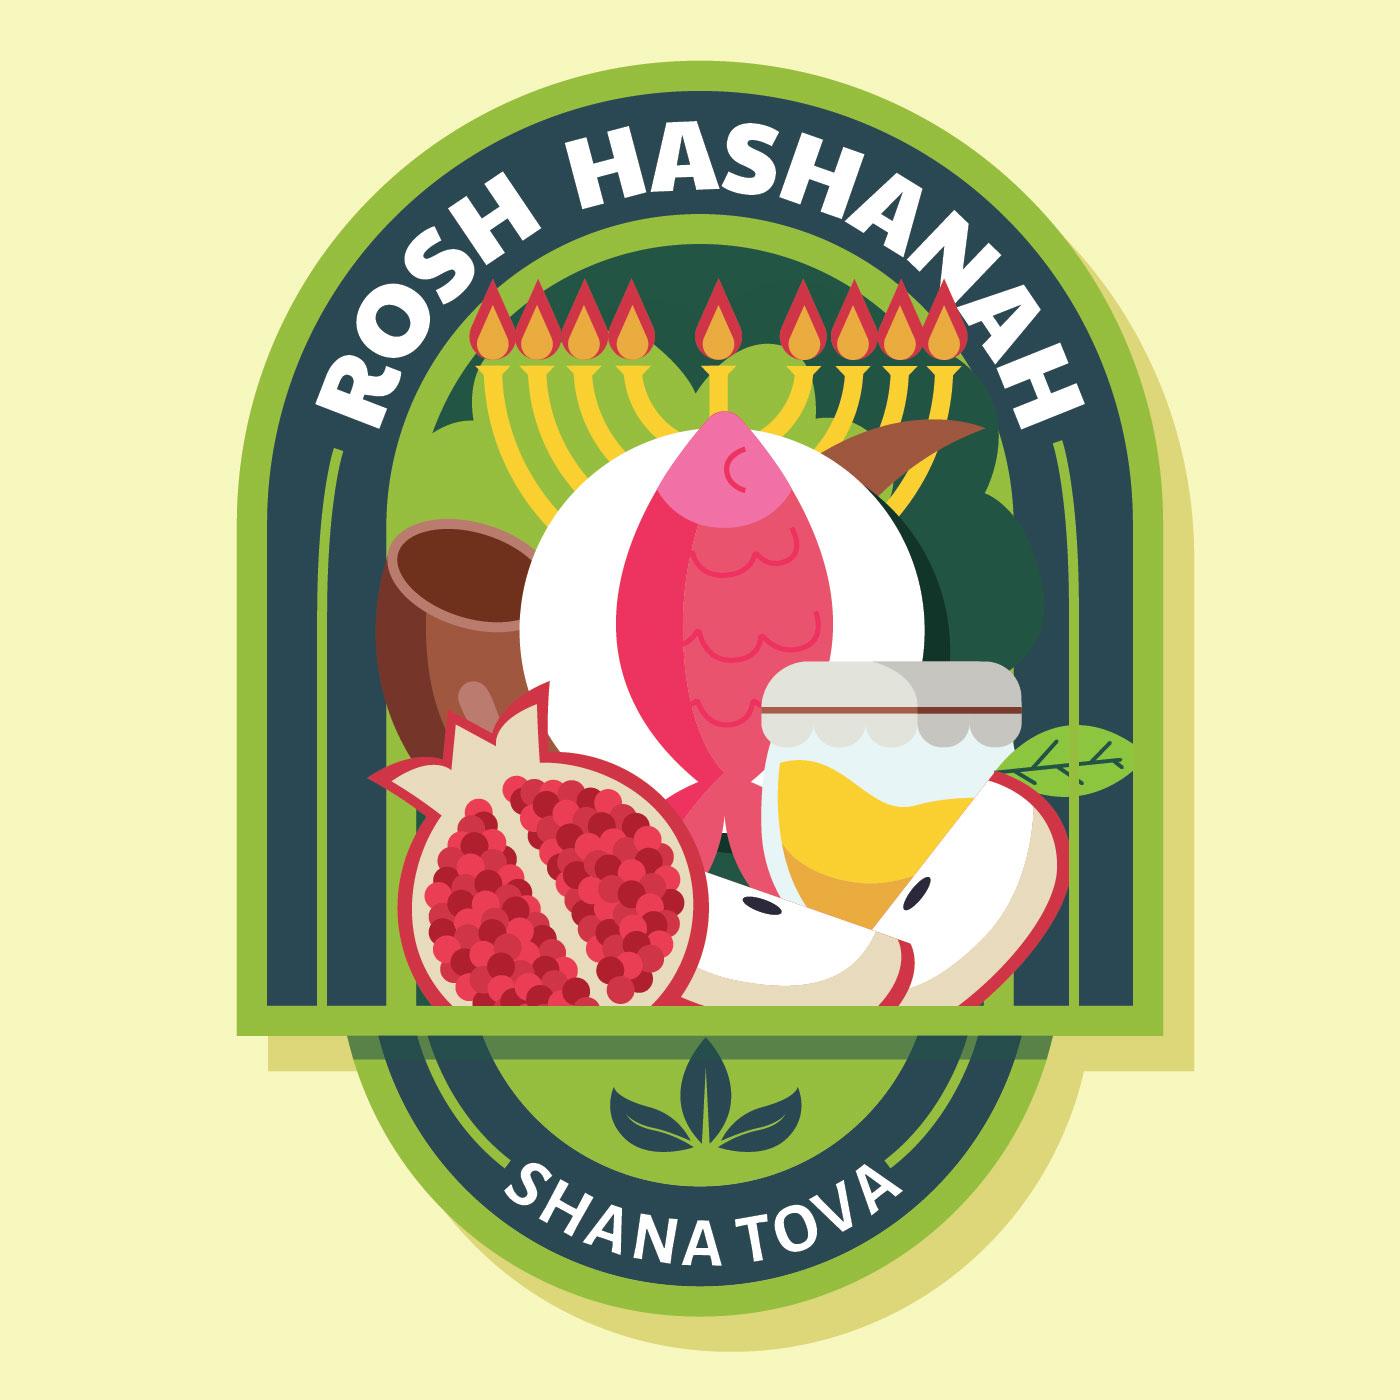 Rosh Hashanah Vector Design Download Free Vector Art Stock